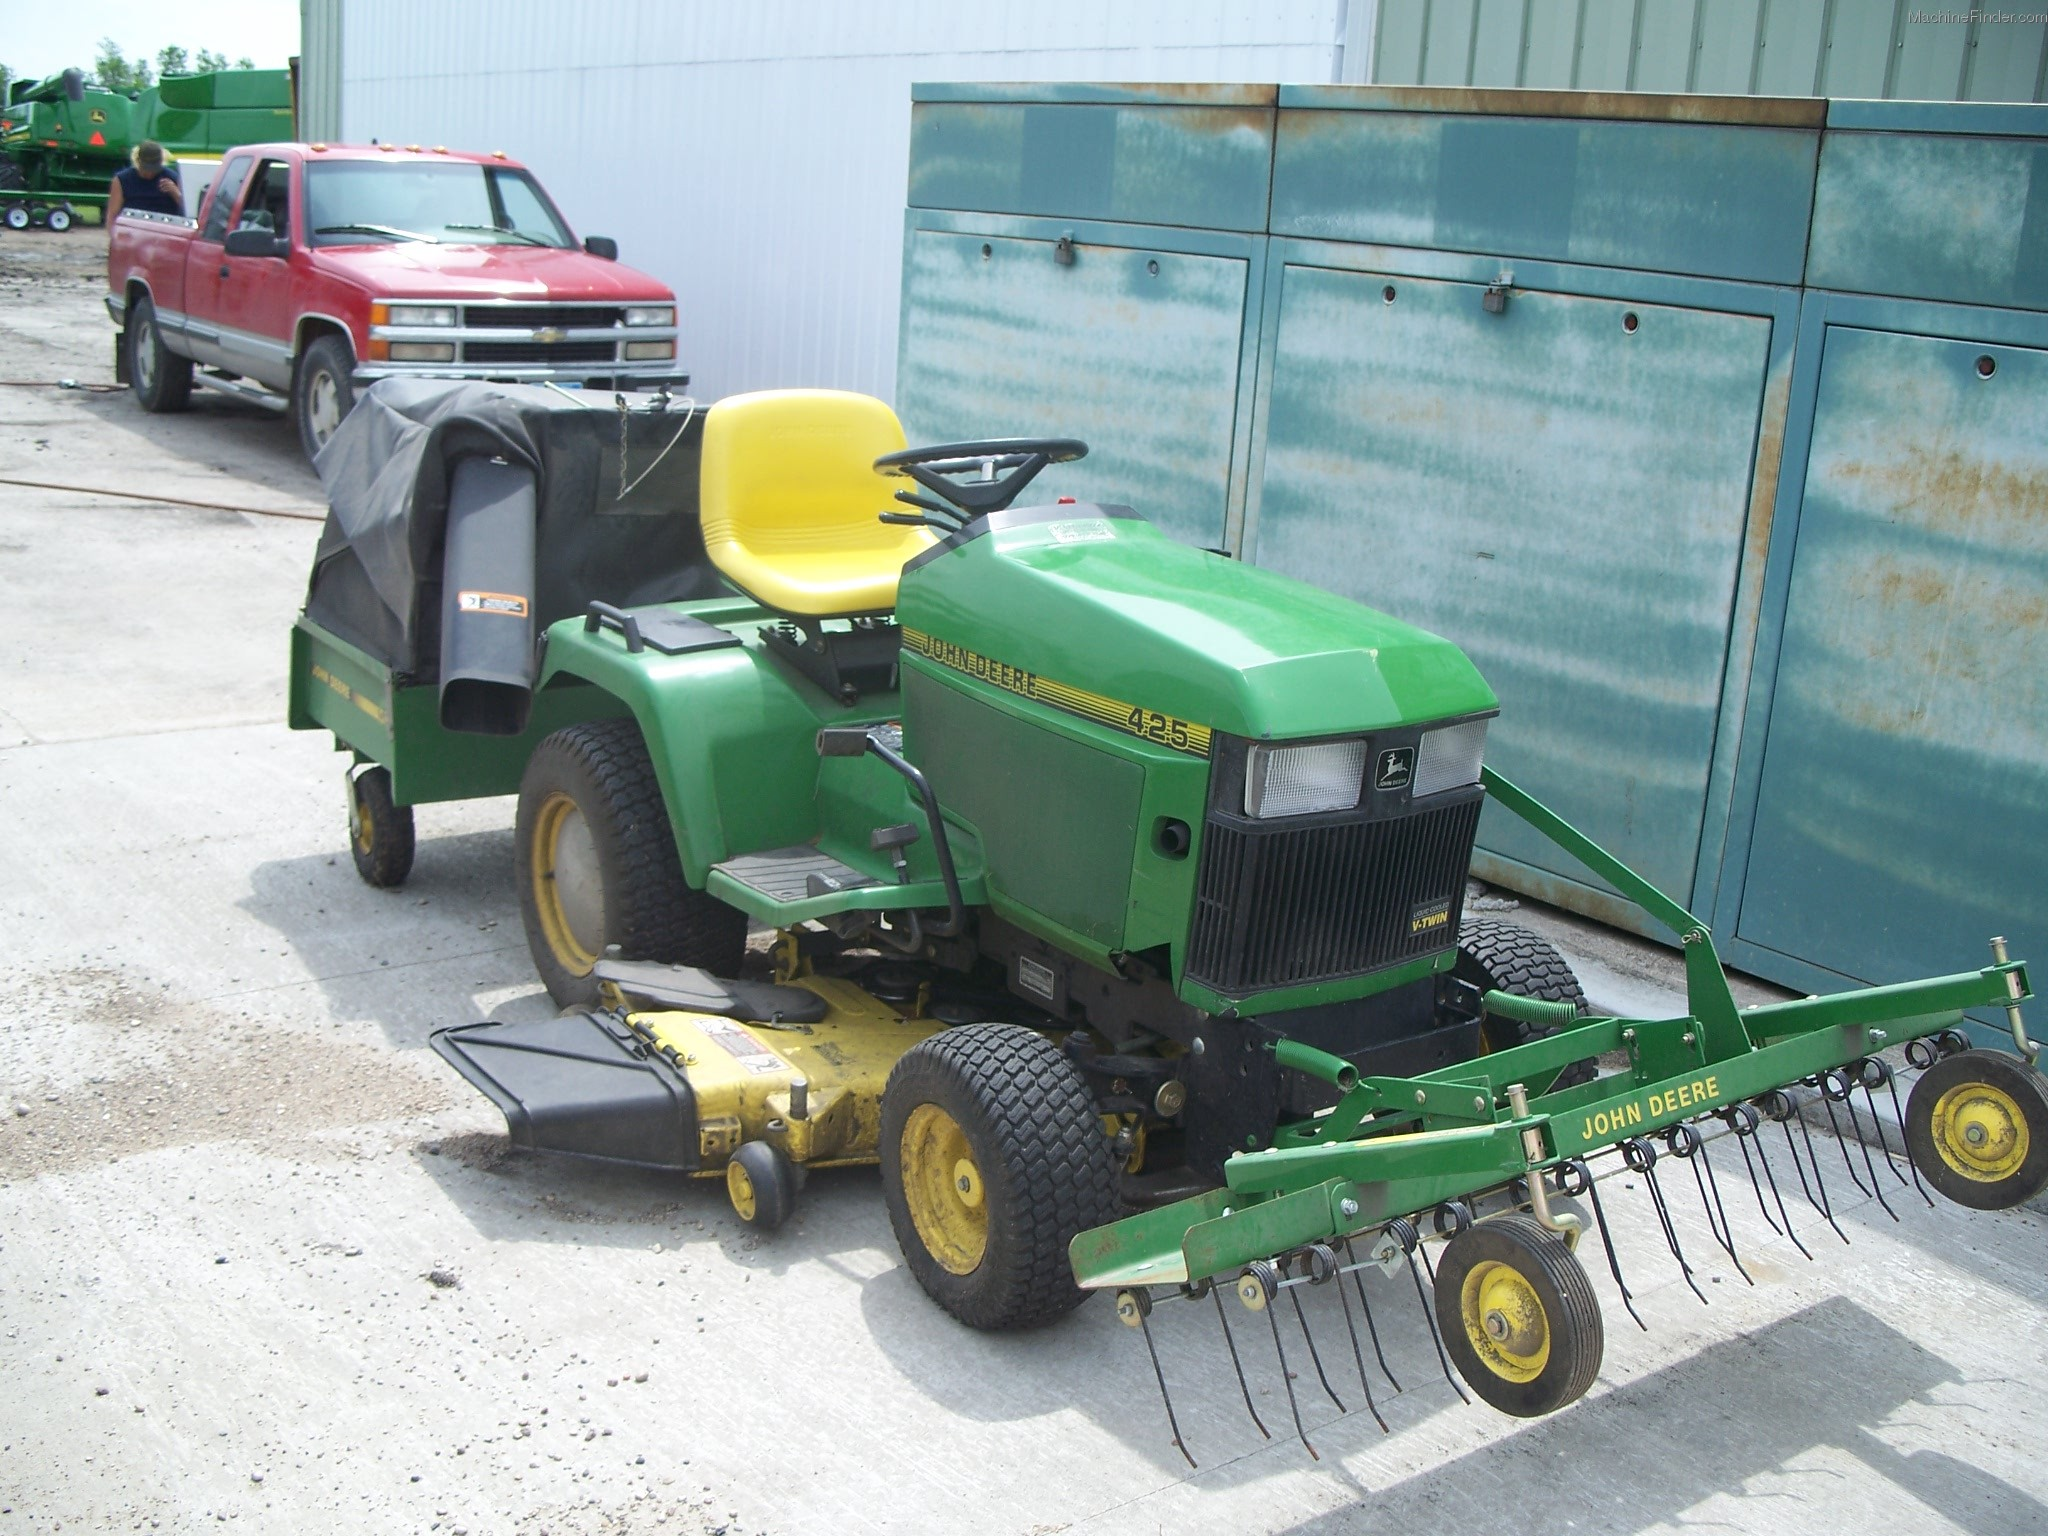 1995 John Deere 425 Lawn & Garden and Commercial Mowing ...